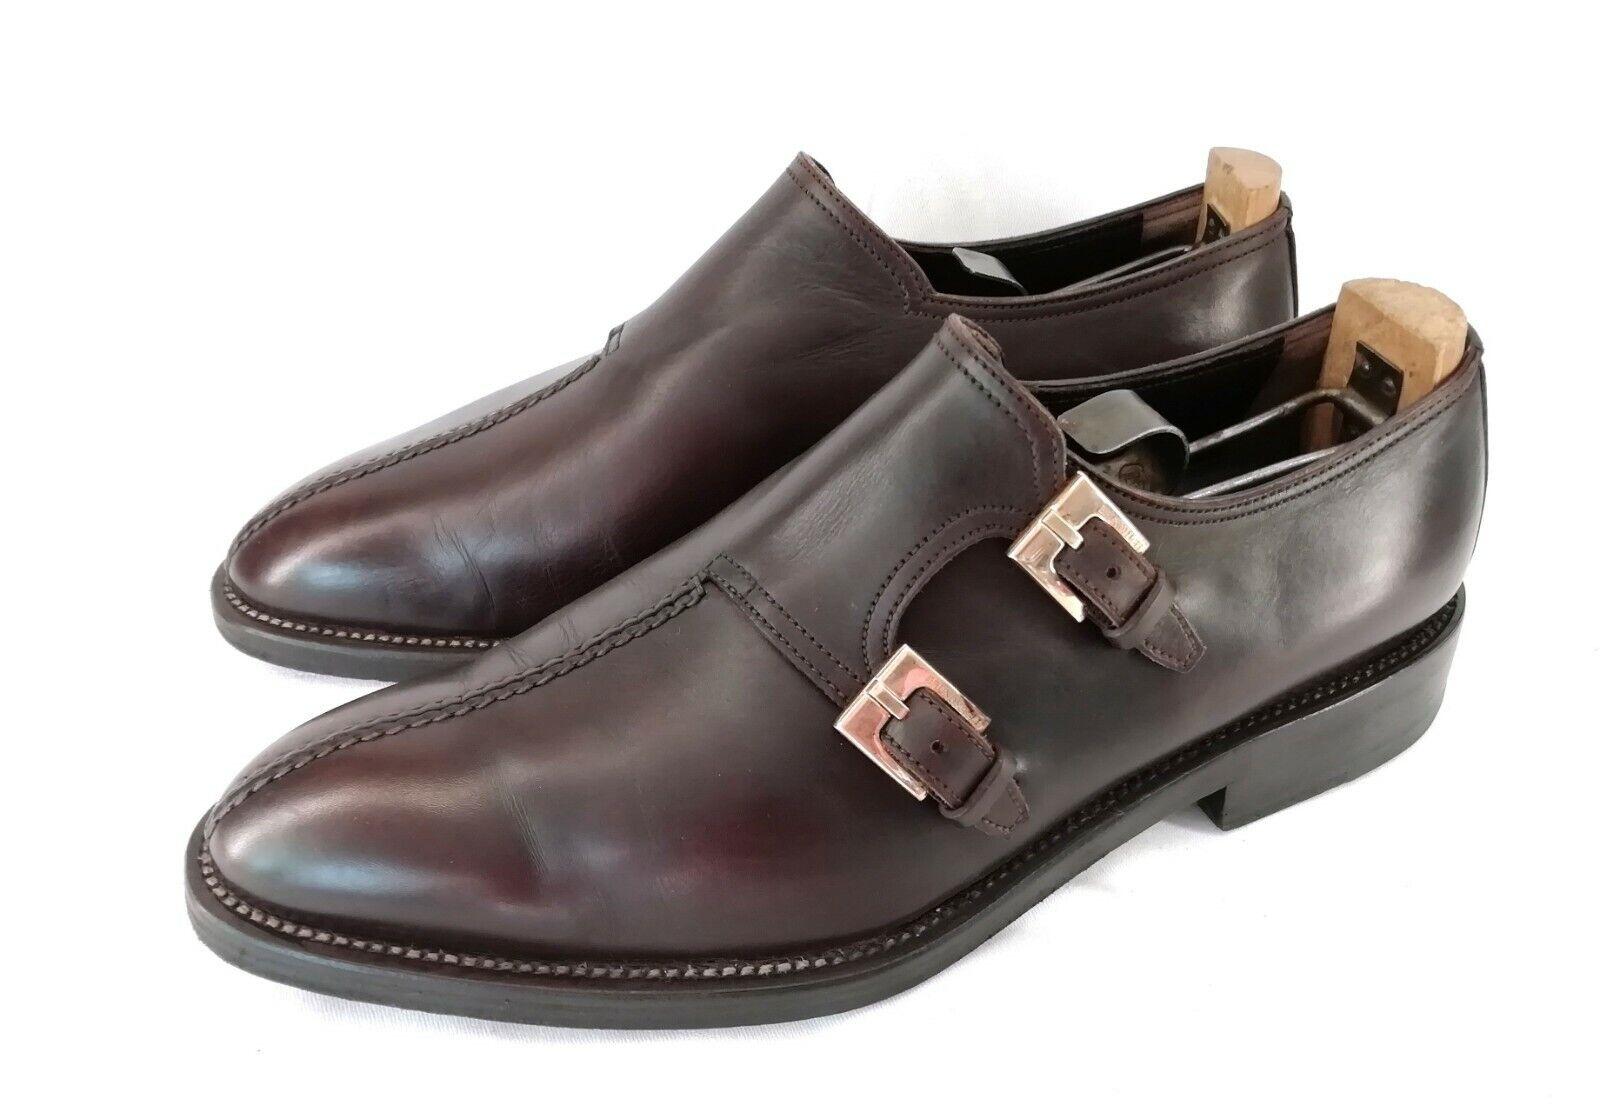 Bcouriro Magli Double Monk Strap Mocassins Chaussures Hommes Marron cuir Oiseau RARE UK 7 T 41